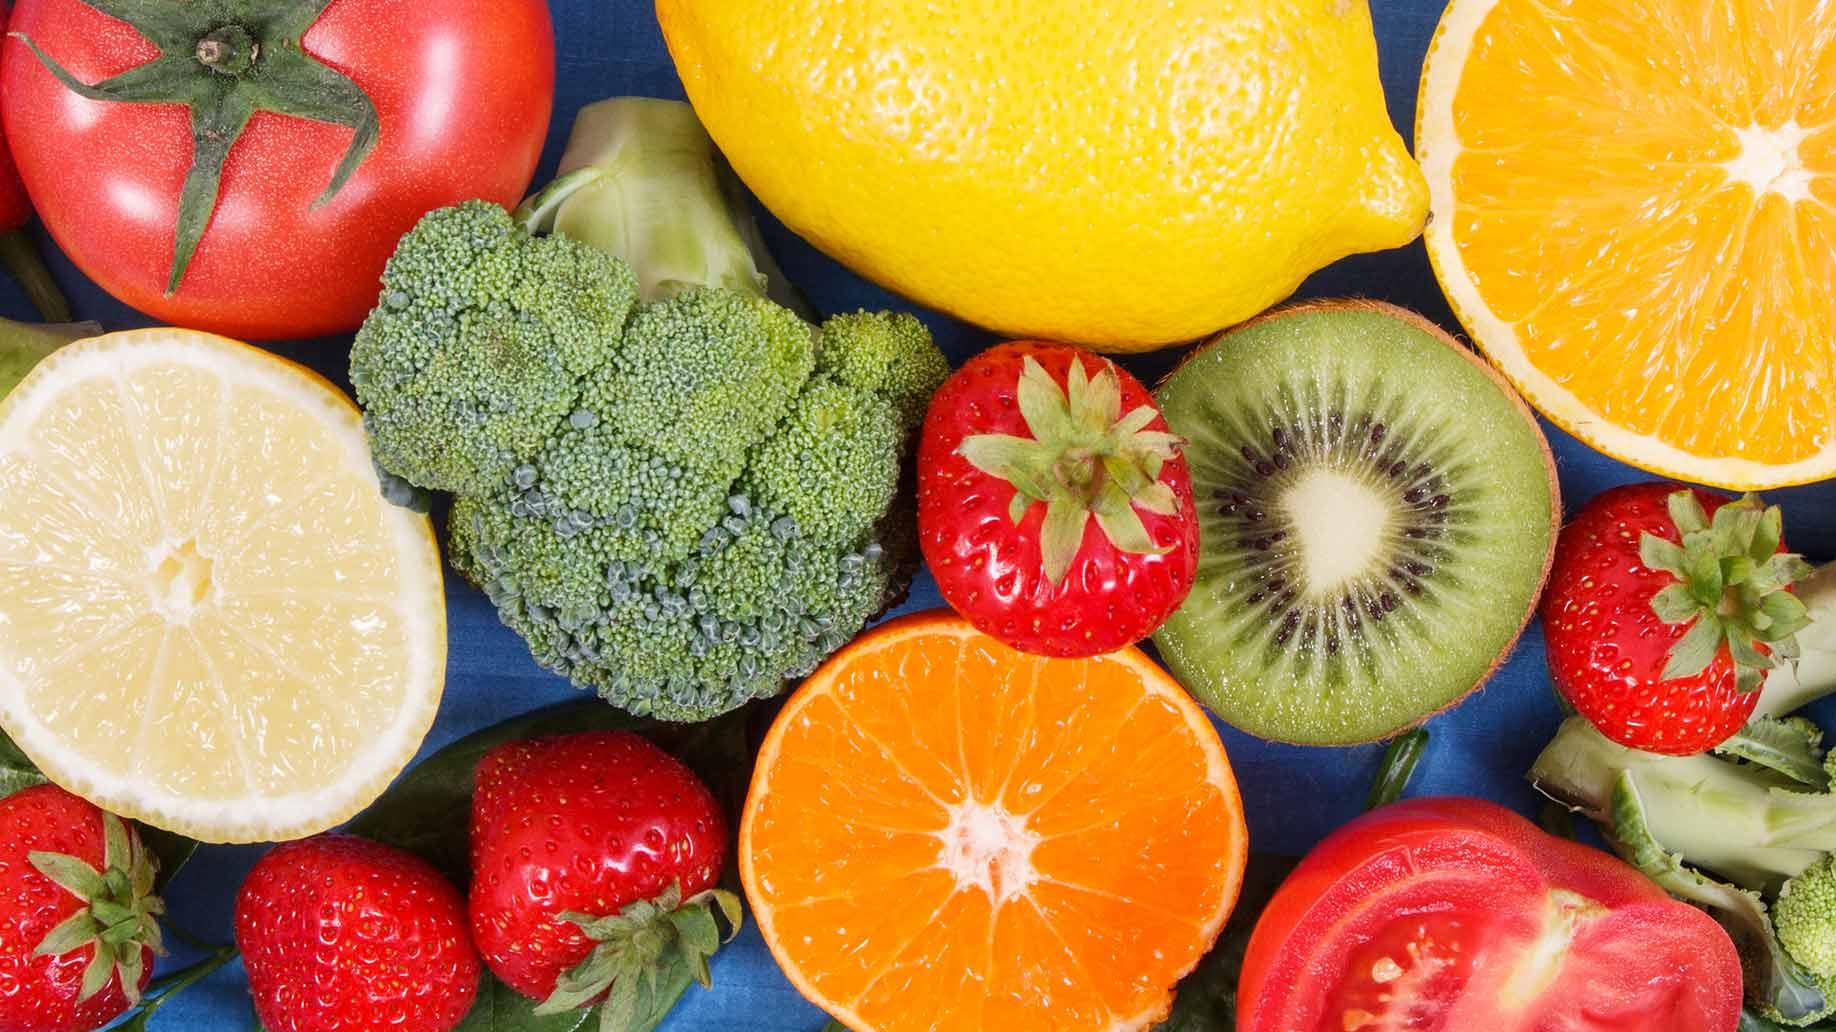 tomato broccoli kiwi strawberries lemon oranges grapefruit vitamin c gout inflammation natural remedies